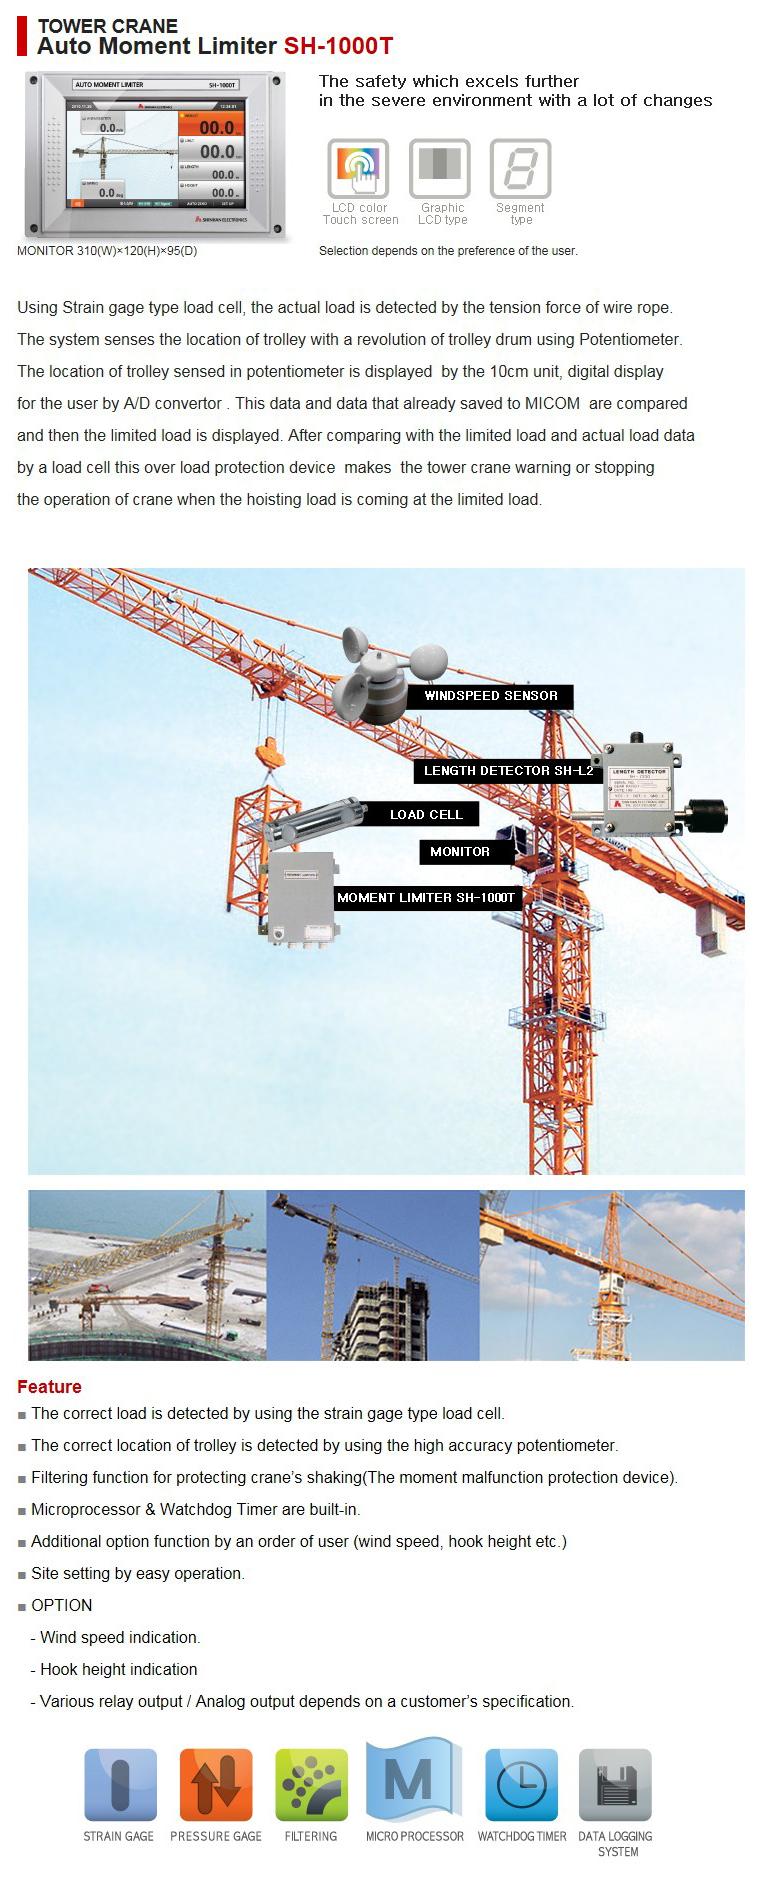 SHINHAN ELECTRIONICS Tower Crane Auto Moment Limiter SH-1000T